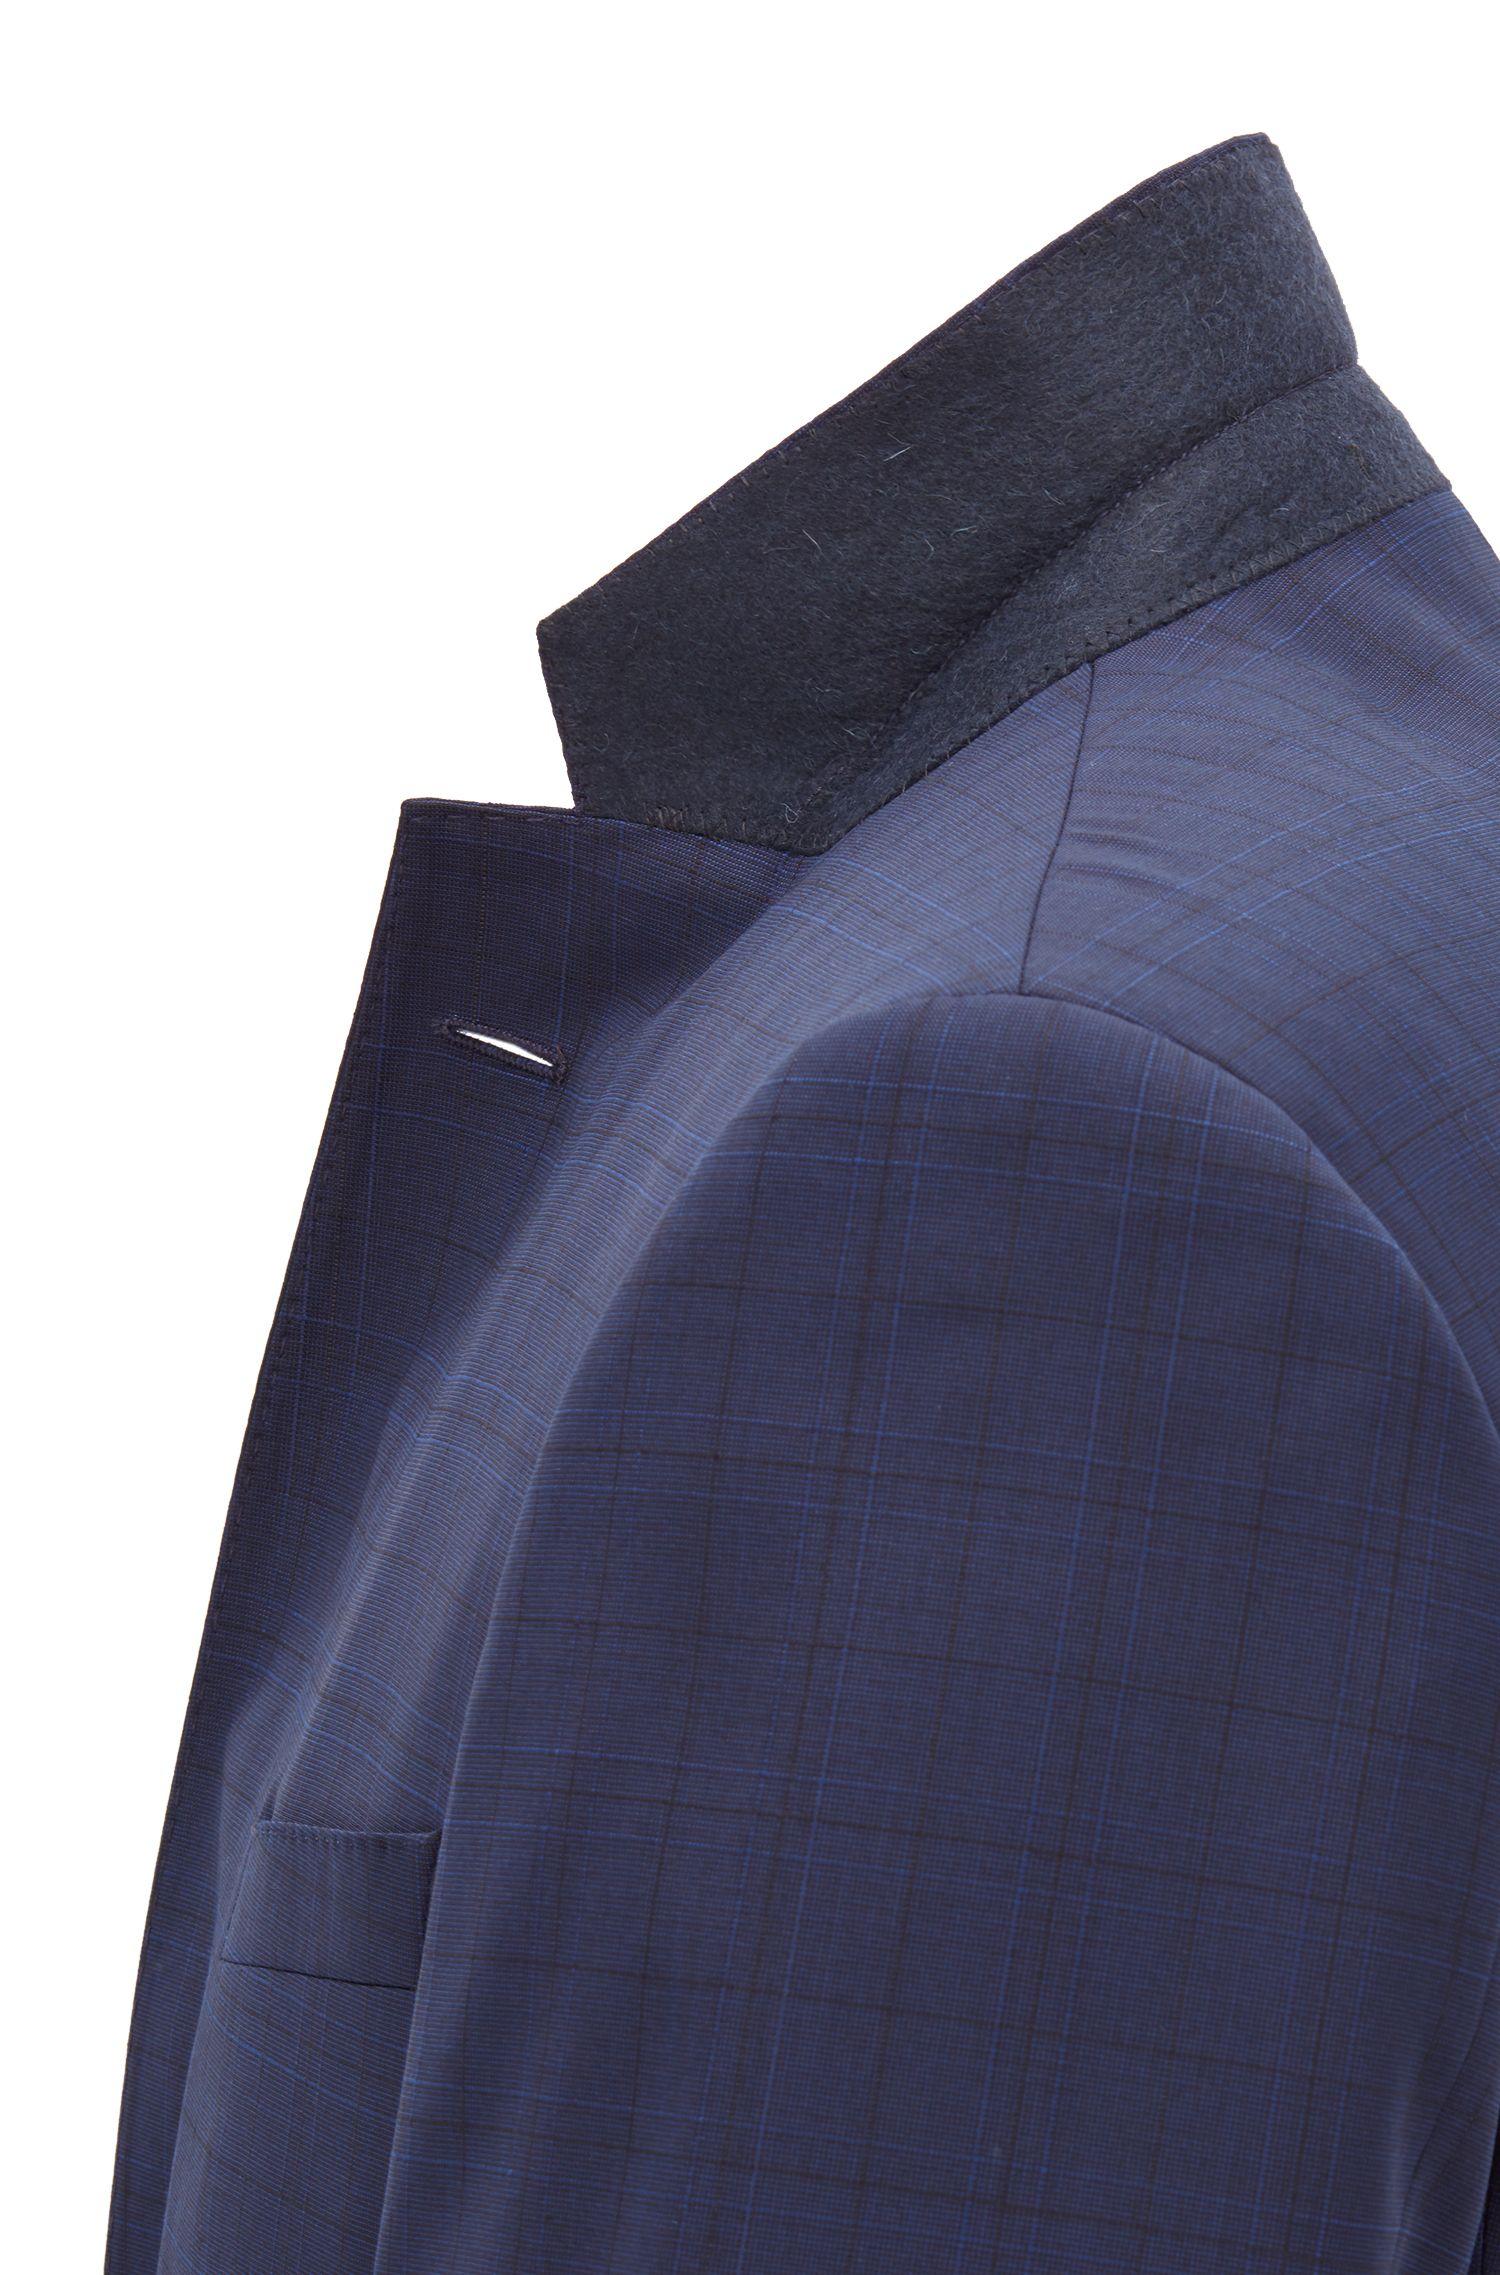 Chaqueta slim fit a cuadros en lana virgen, Azul oscuro